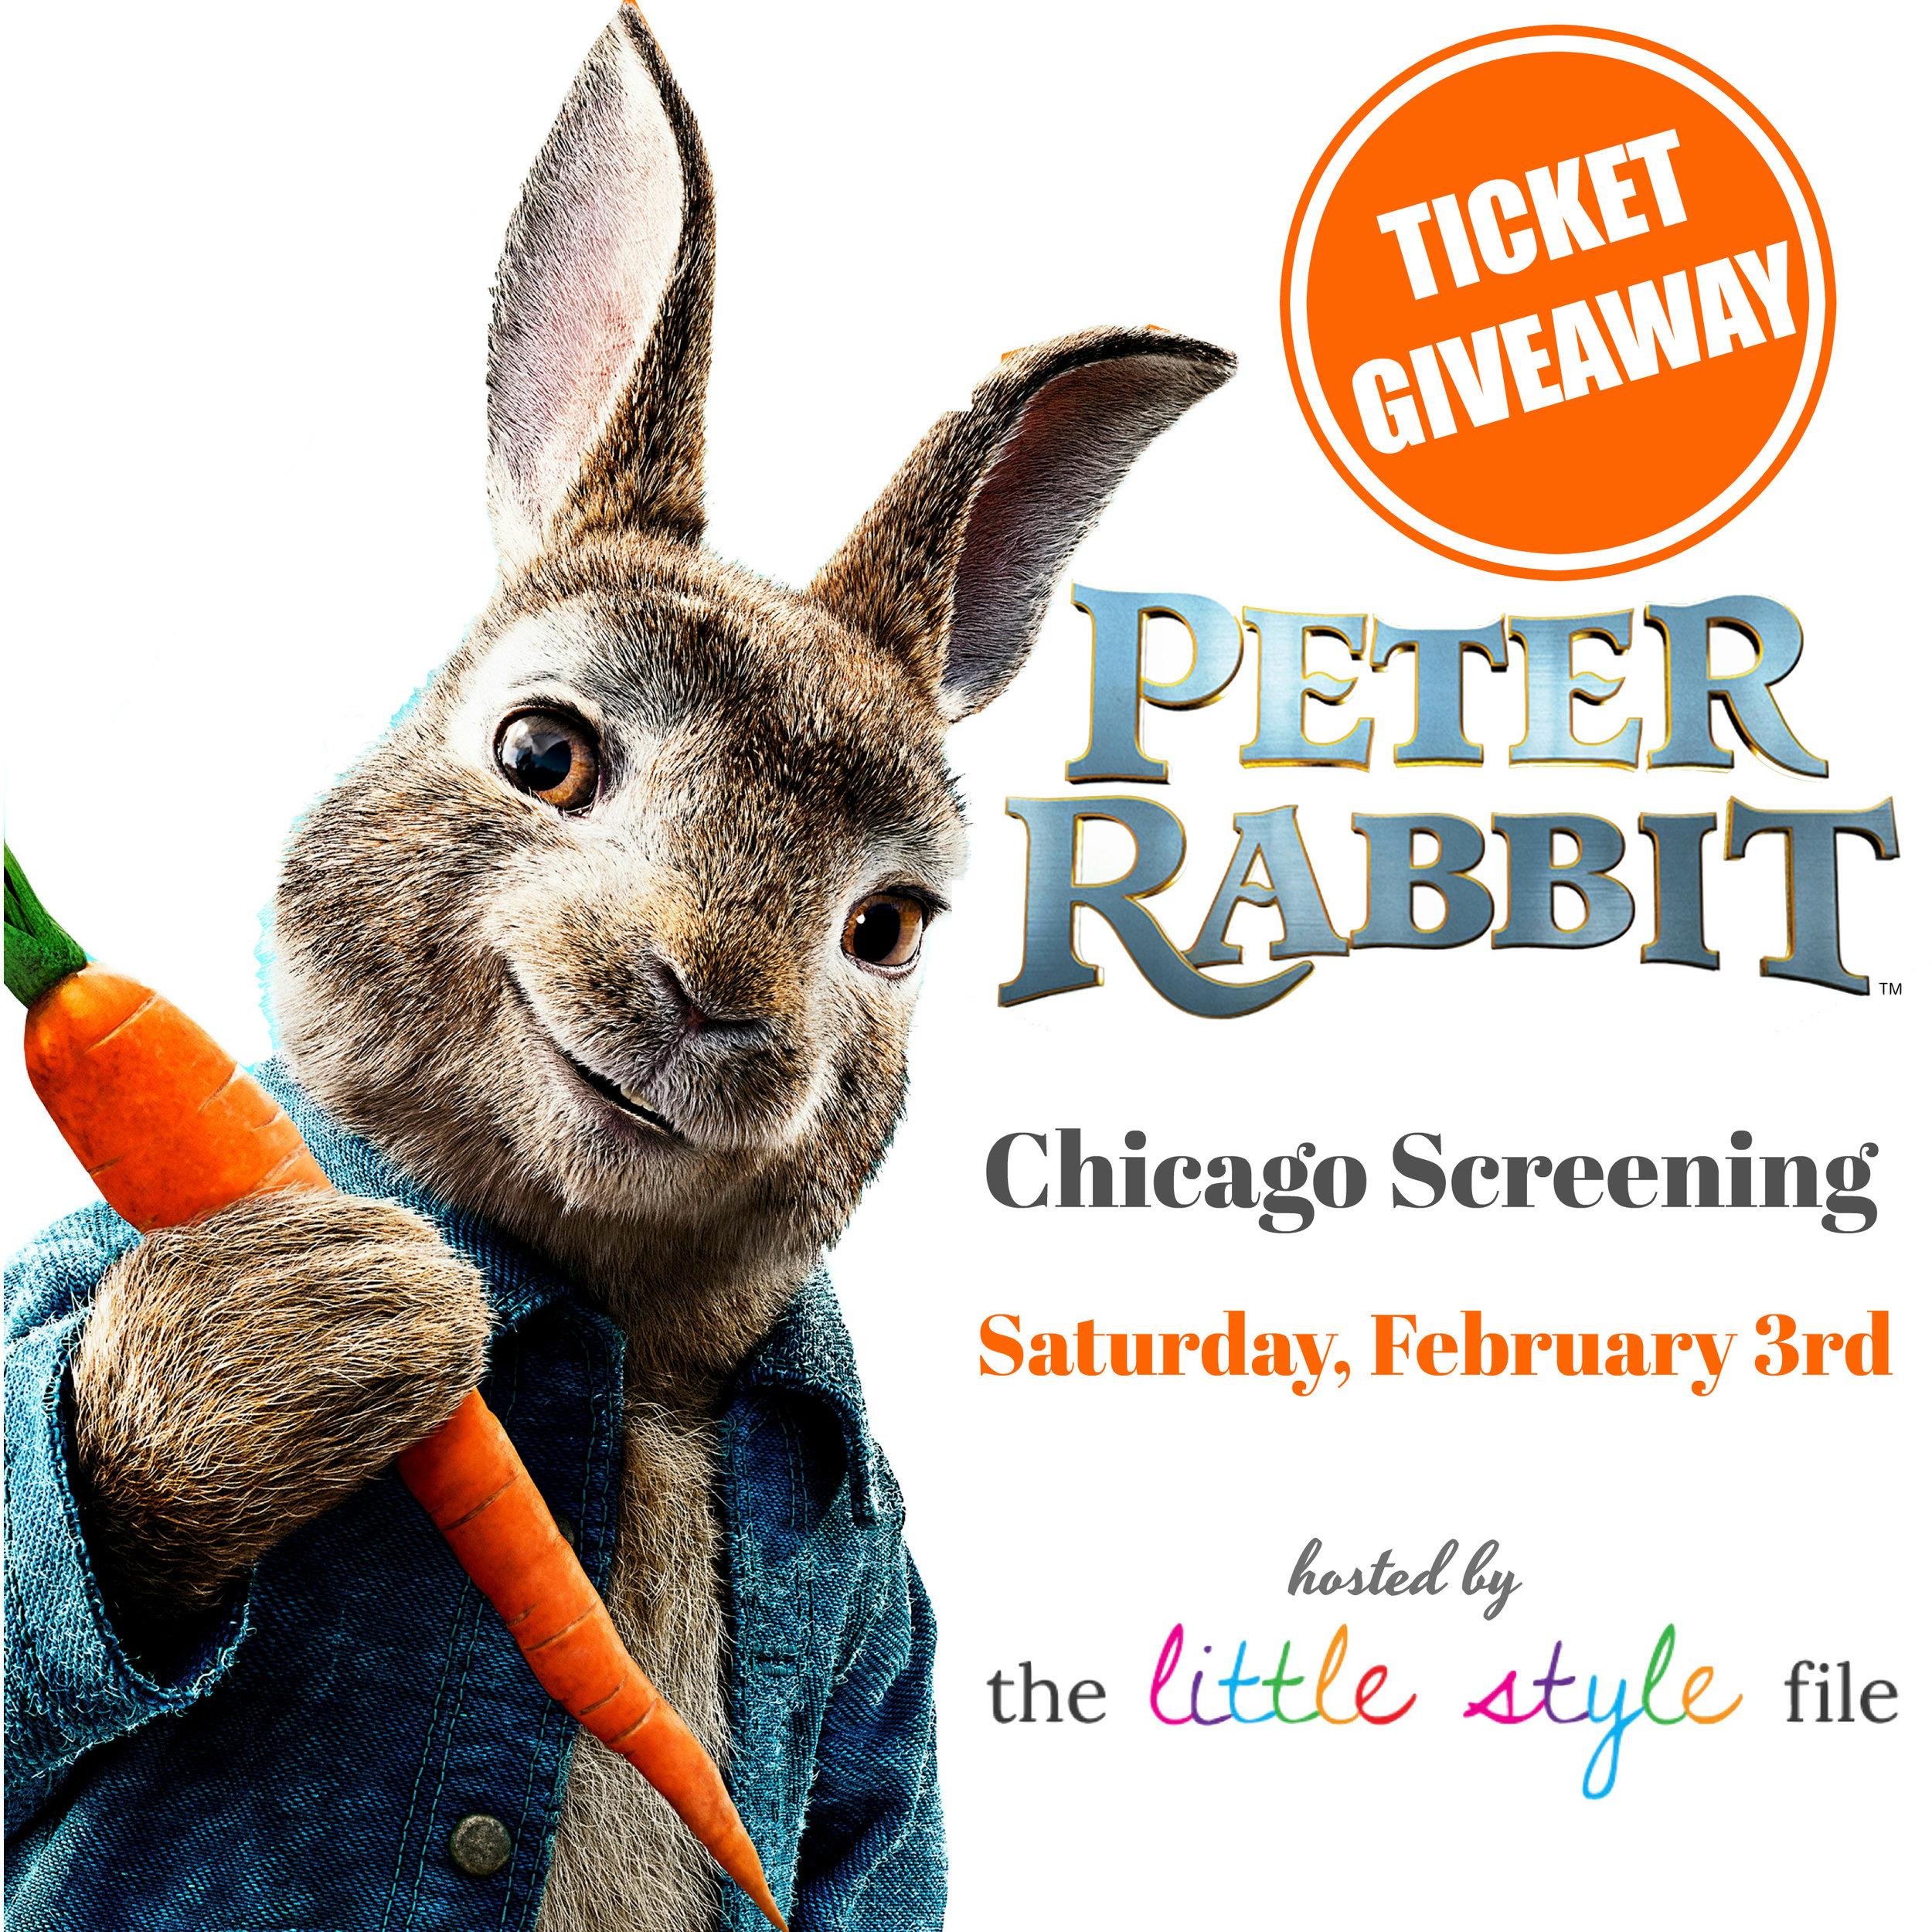 peter rabbit tlsf-2.jpg